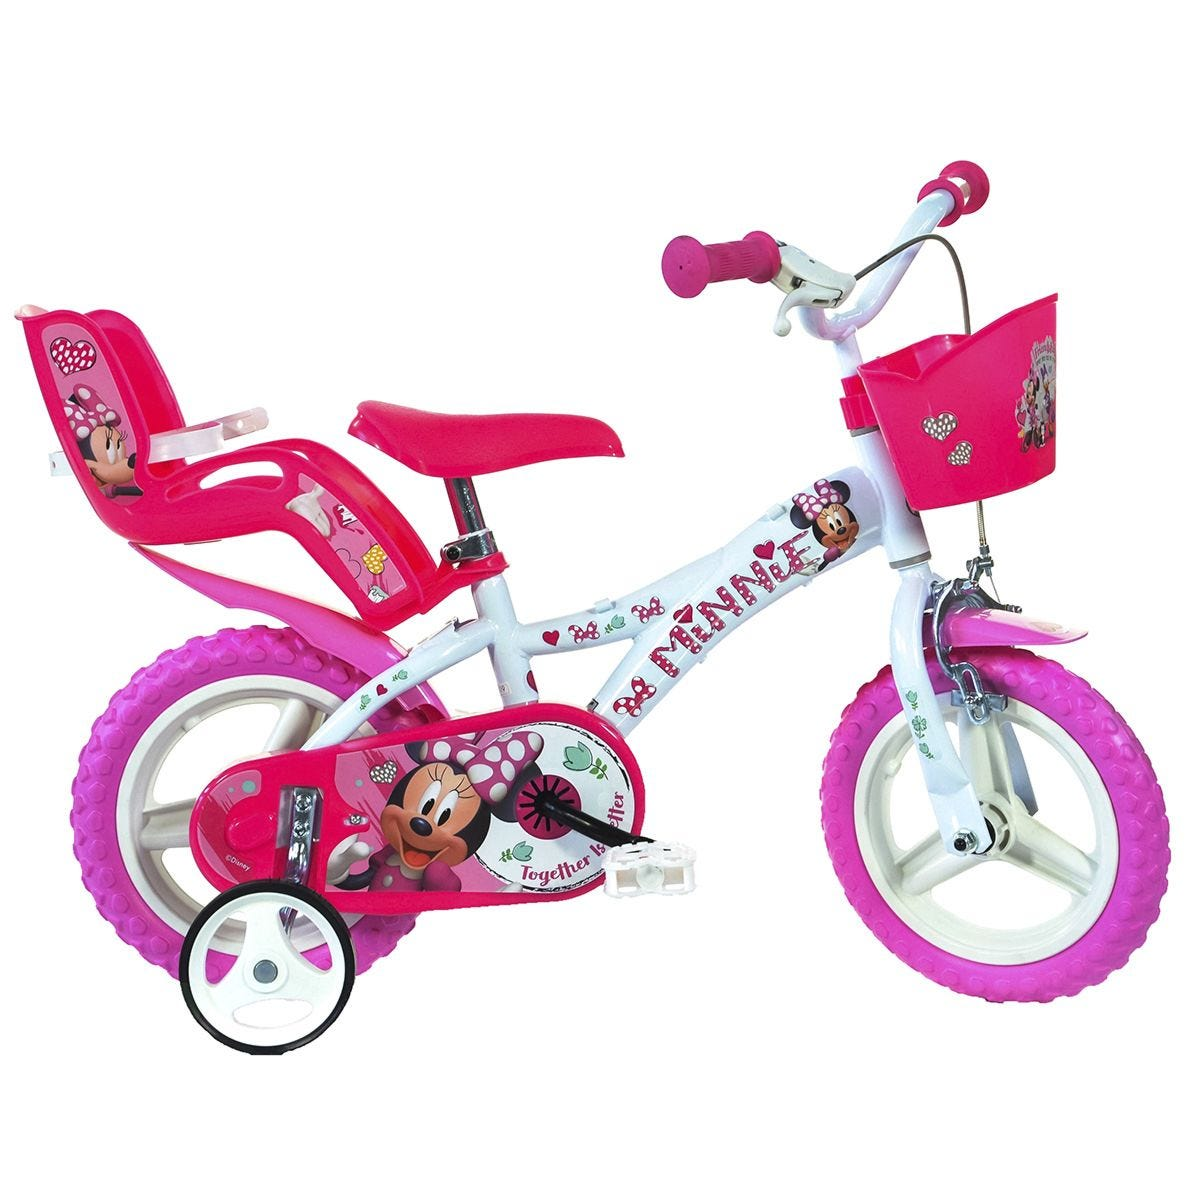 Disney's Minnie Mouse Kids Bike